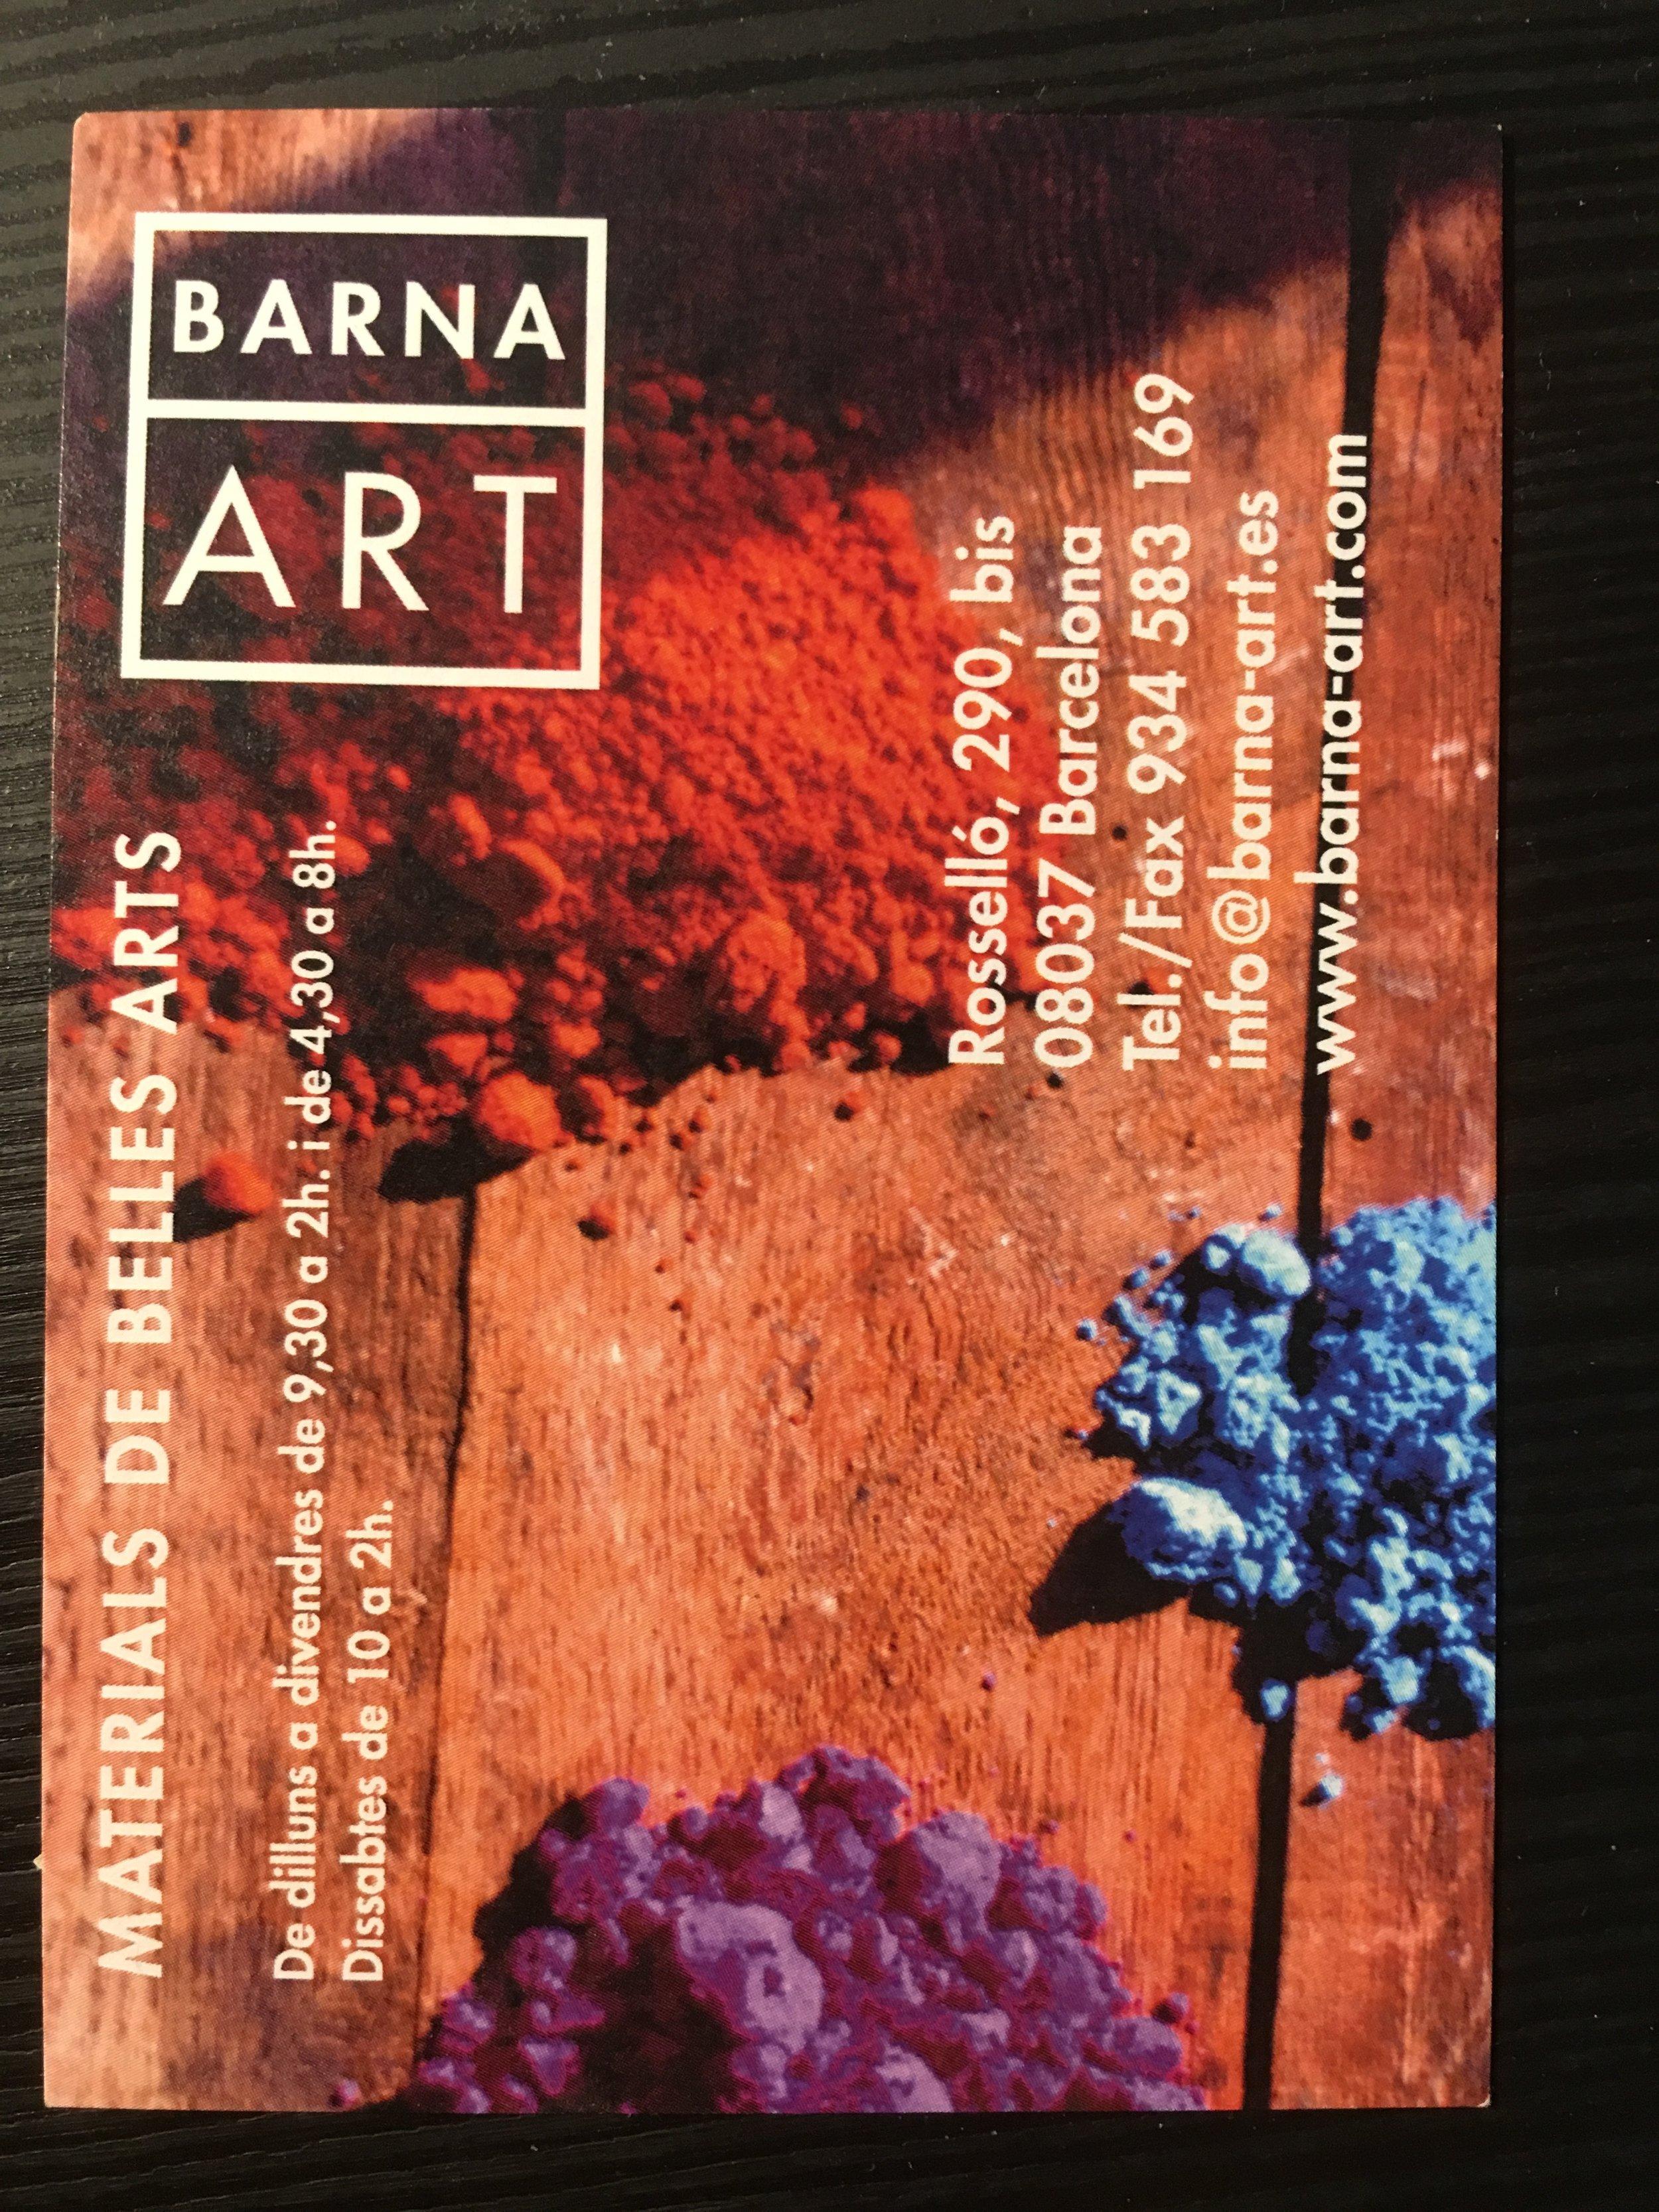 Barna Art, Barcelona canvas sizes